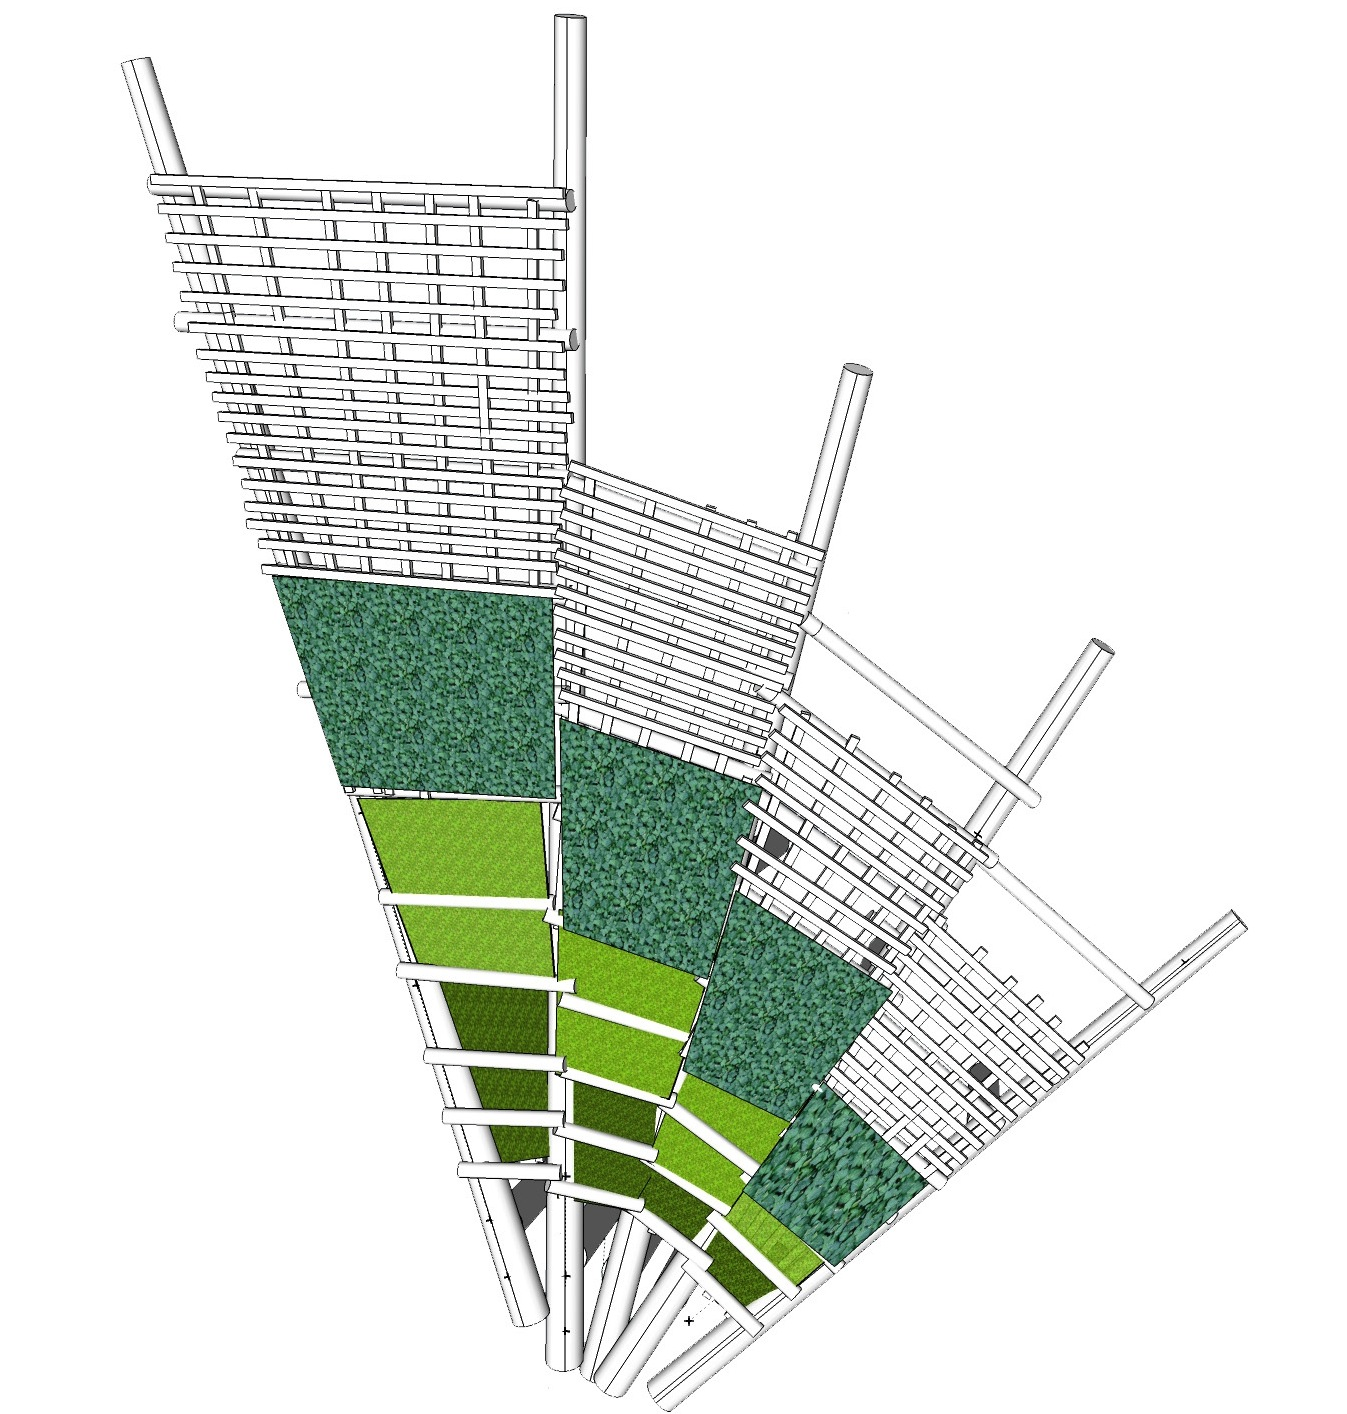 Pavillion Model with Roof copy.jpg